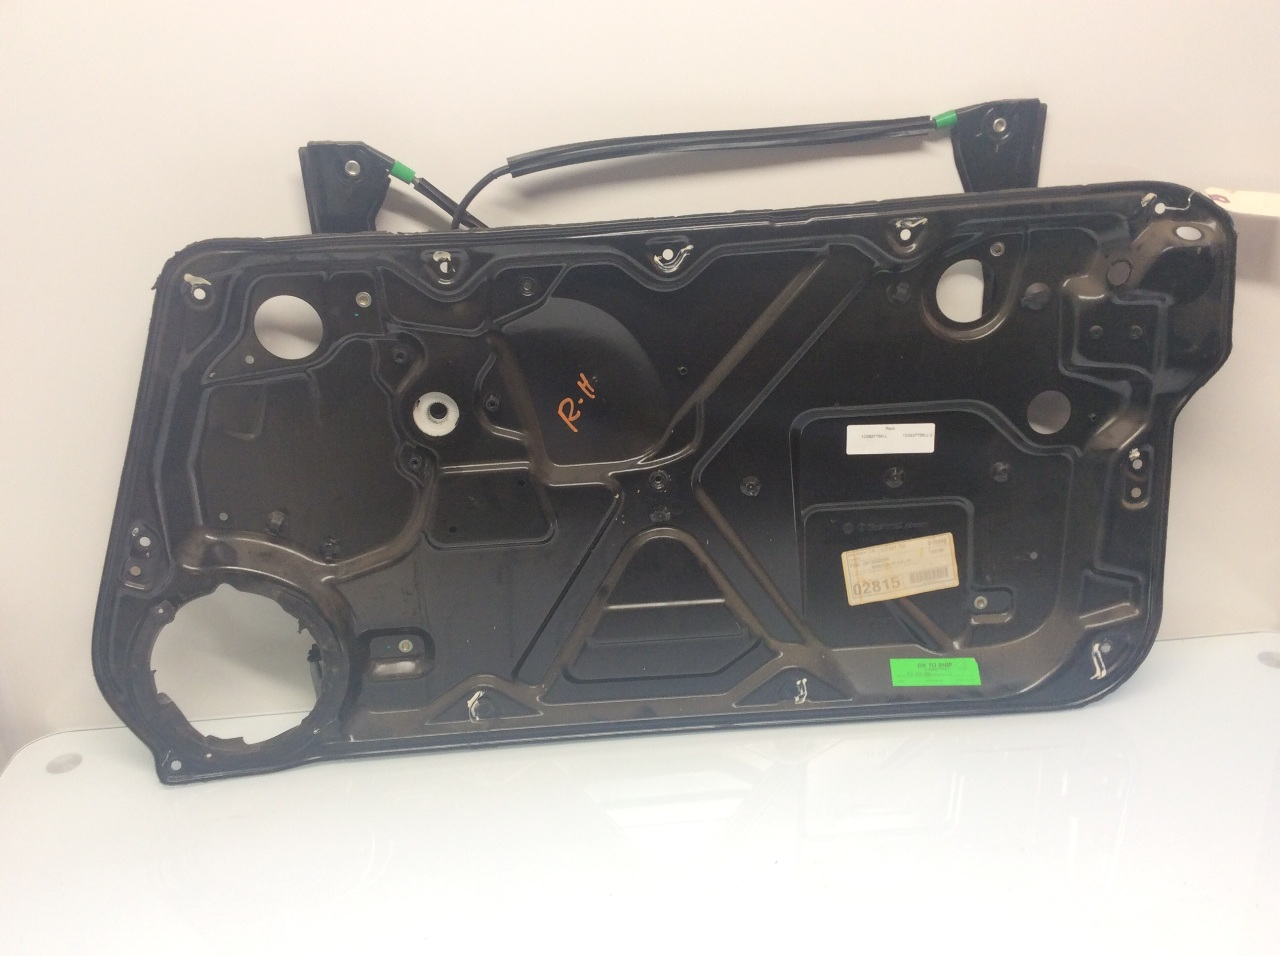 Find 99 00 01 02 03 04 05 vw jetta gti vr6 egr valve combi for 2000 beetle window regulator